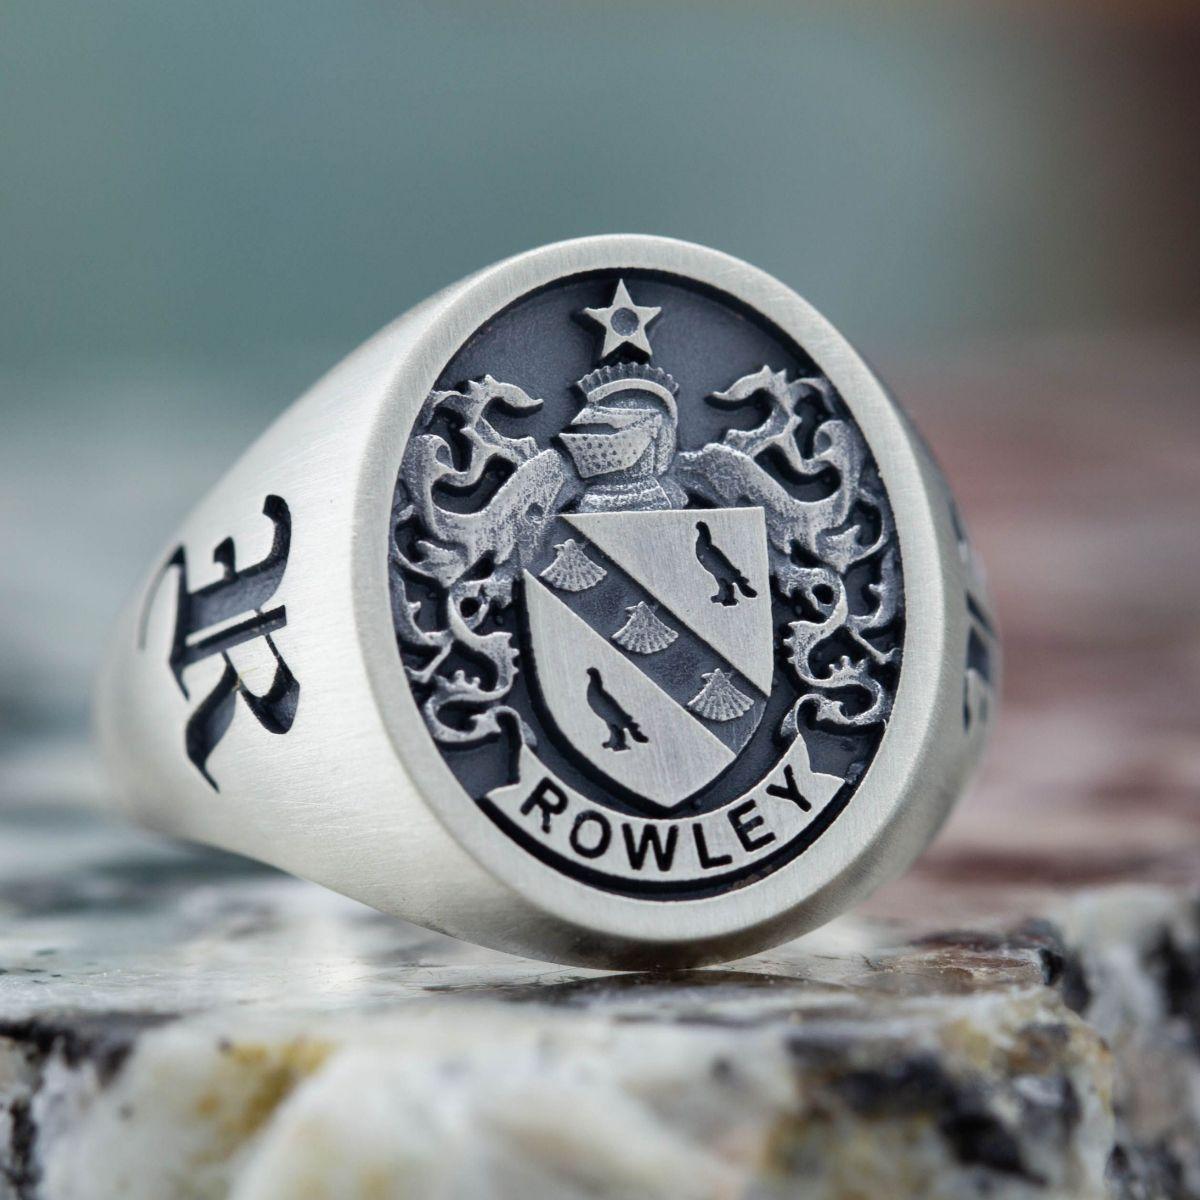 Family Coat Of Arms Design | Custom Family Crest Rings Design Your Own Coat Of Arms Ring